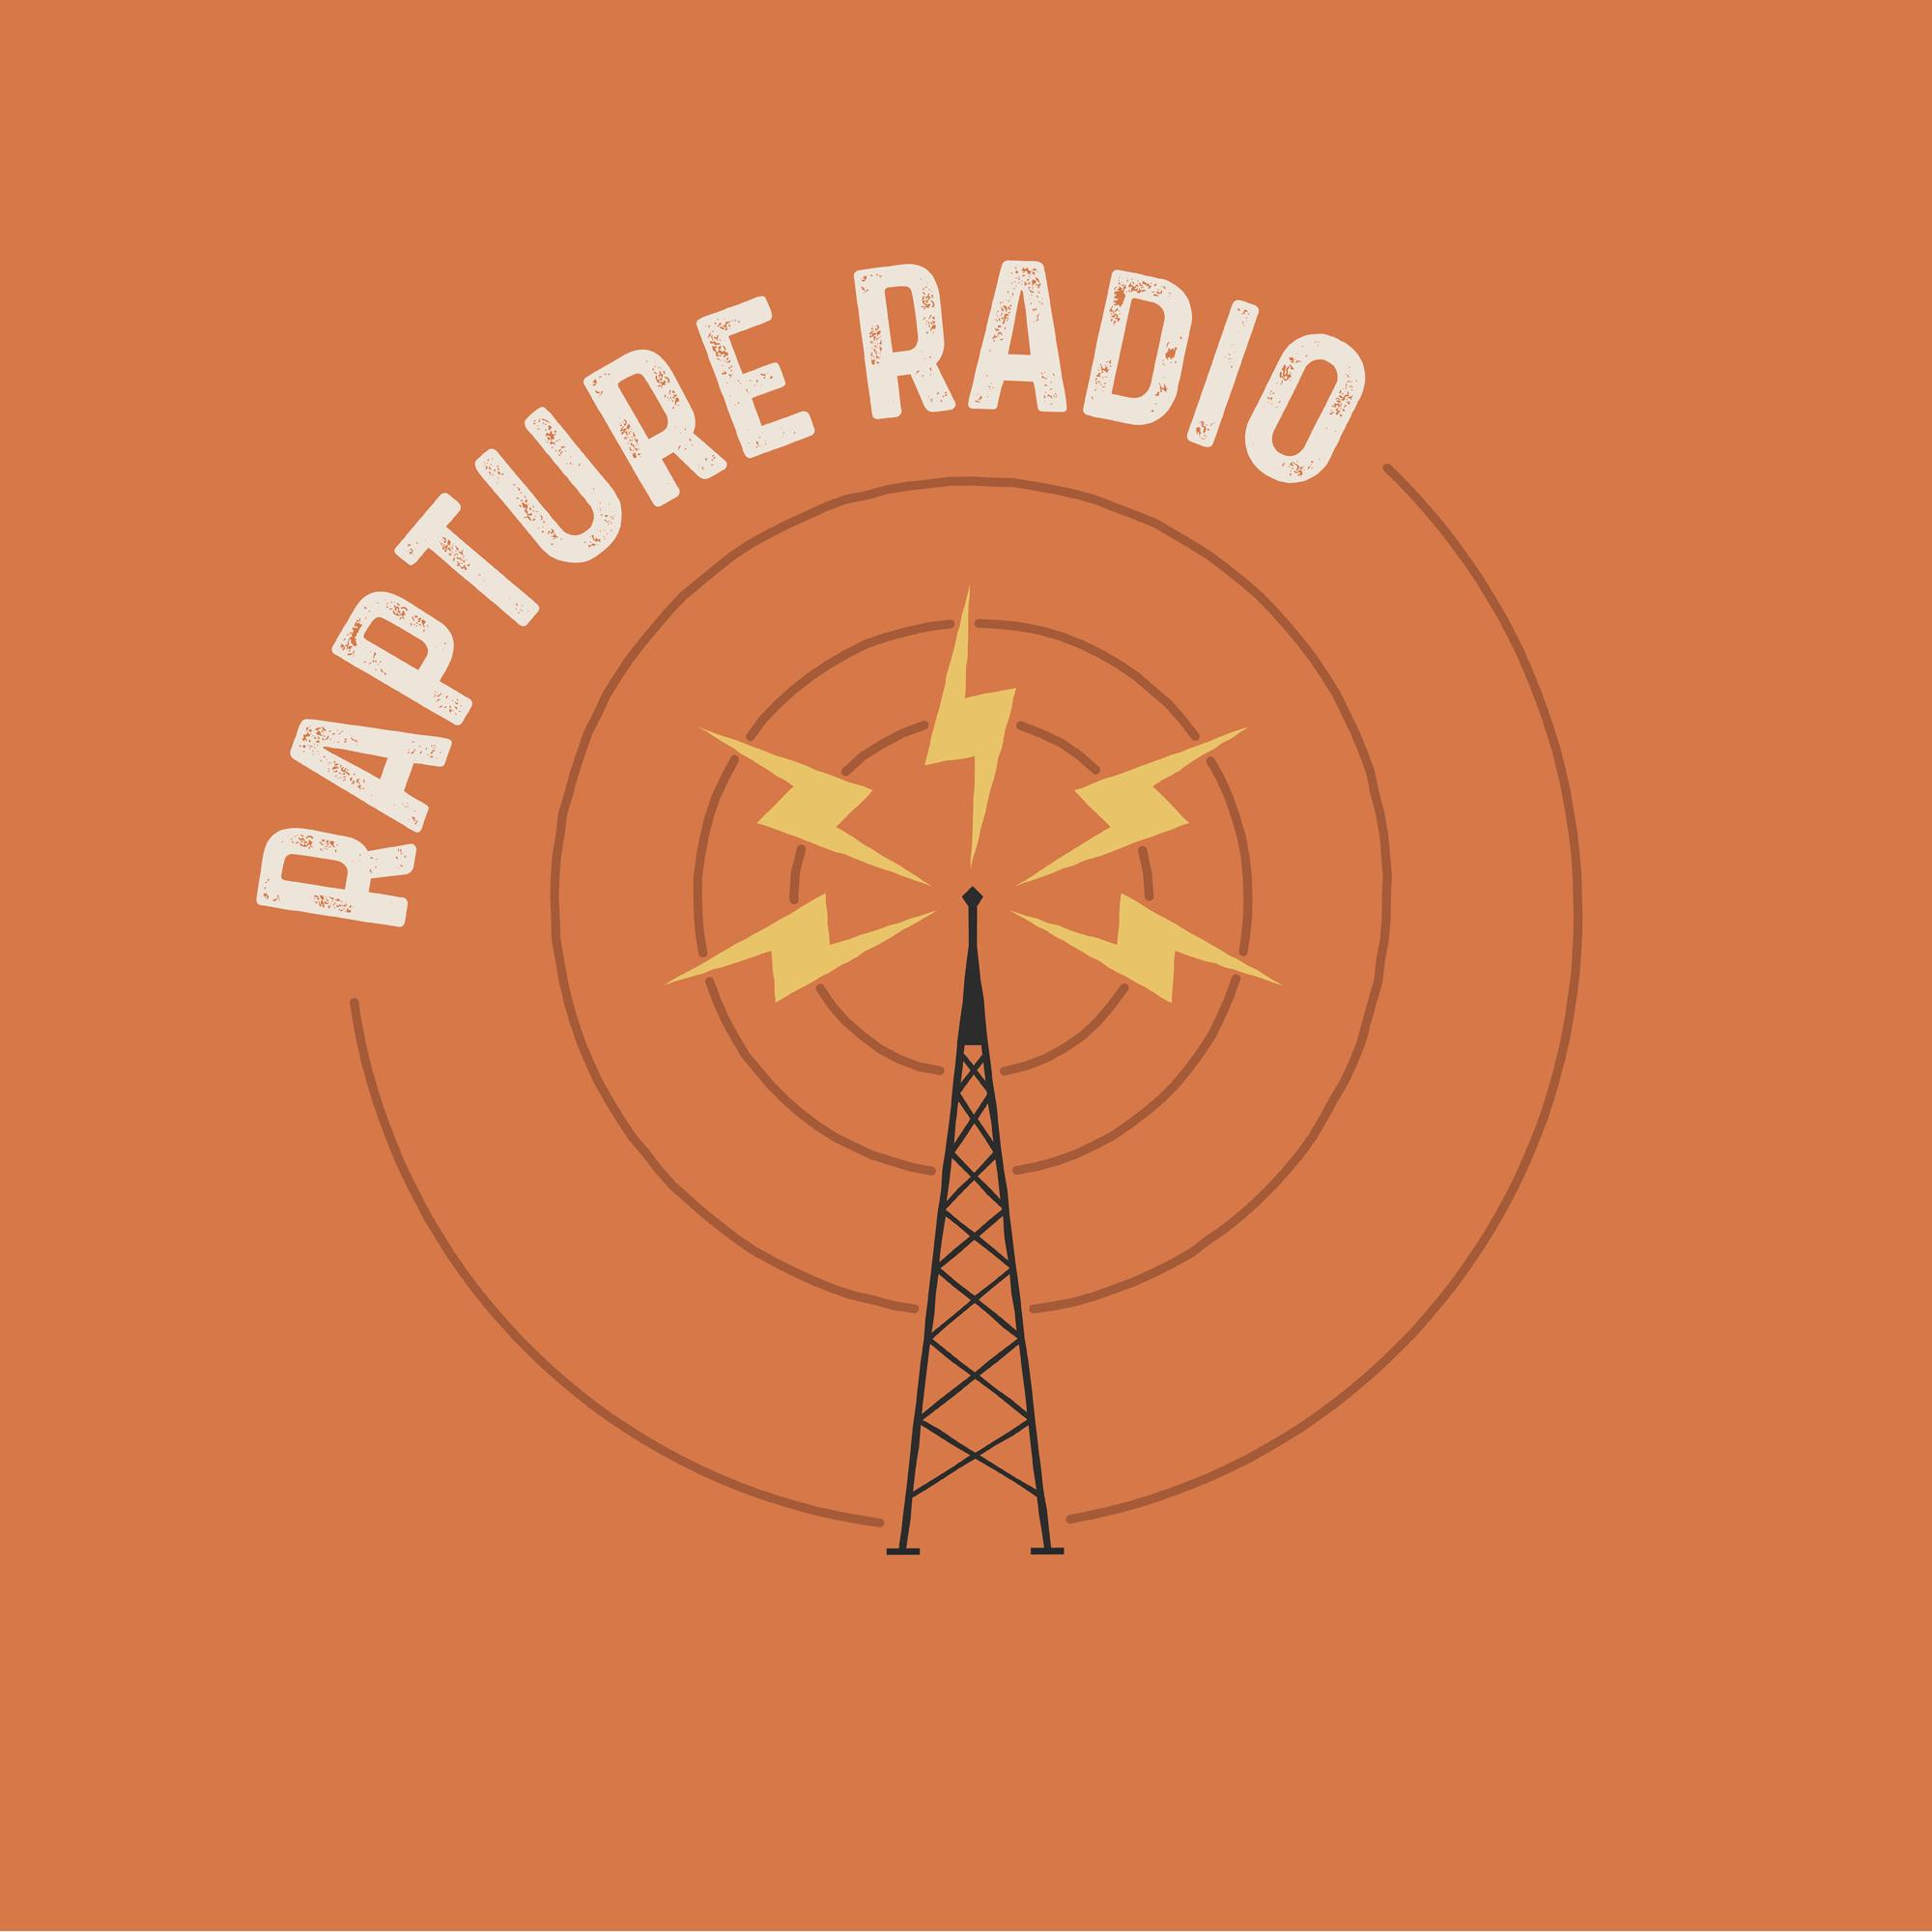 Show artwork for Rapture Radio